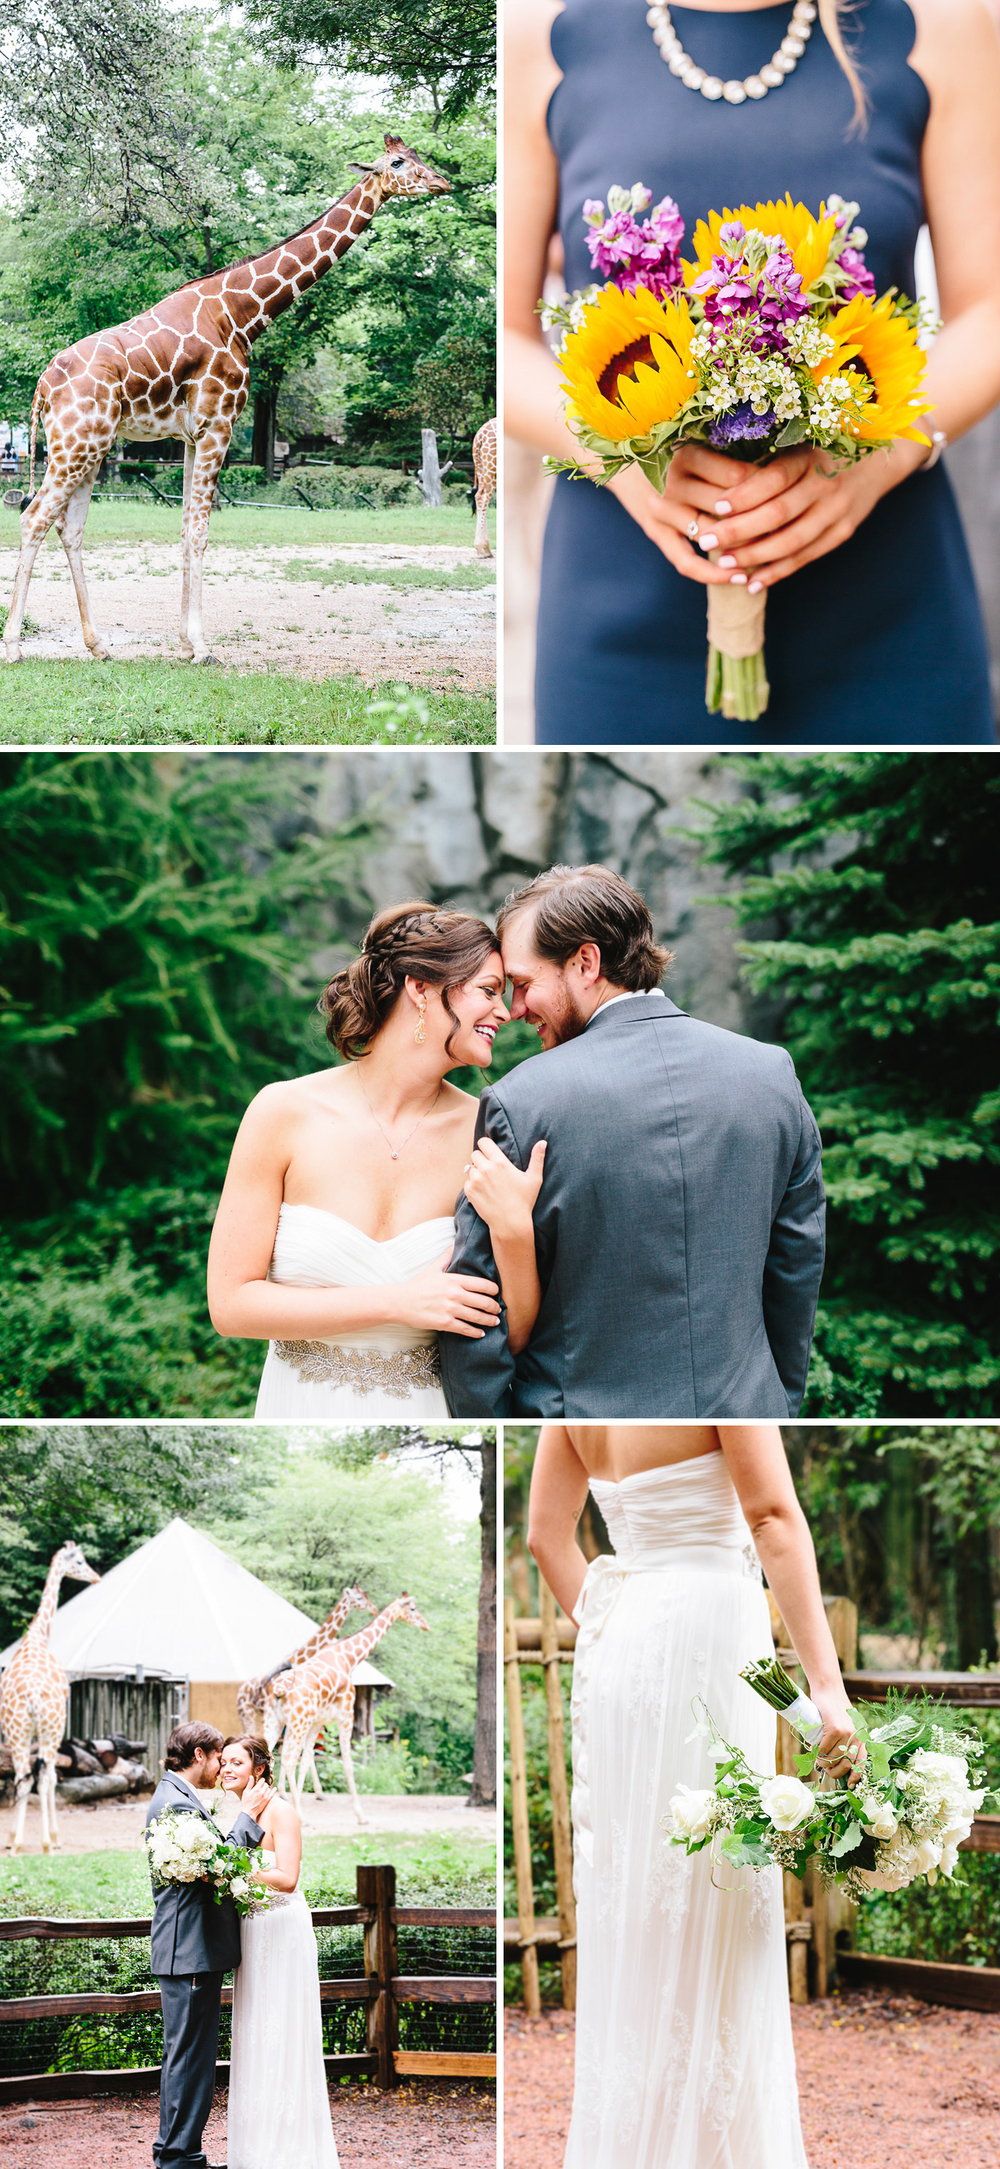 Chicago_Fine_Art_Wedding_Photography_hernandez.jpg